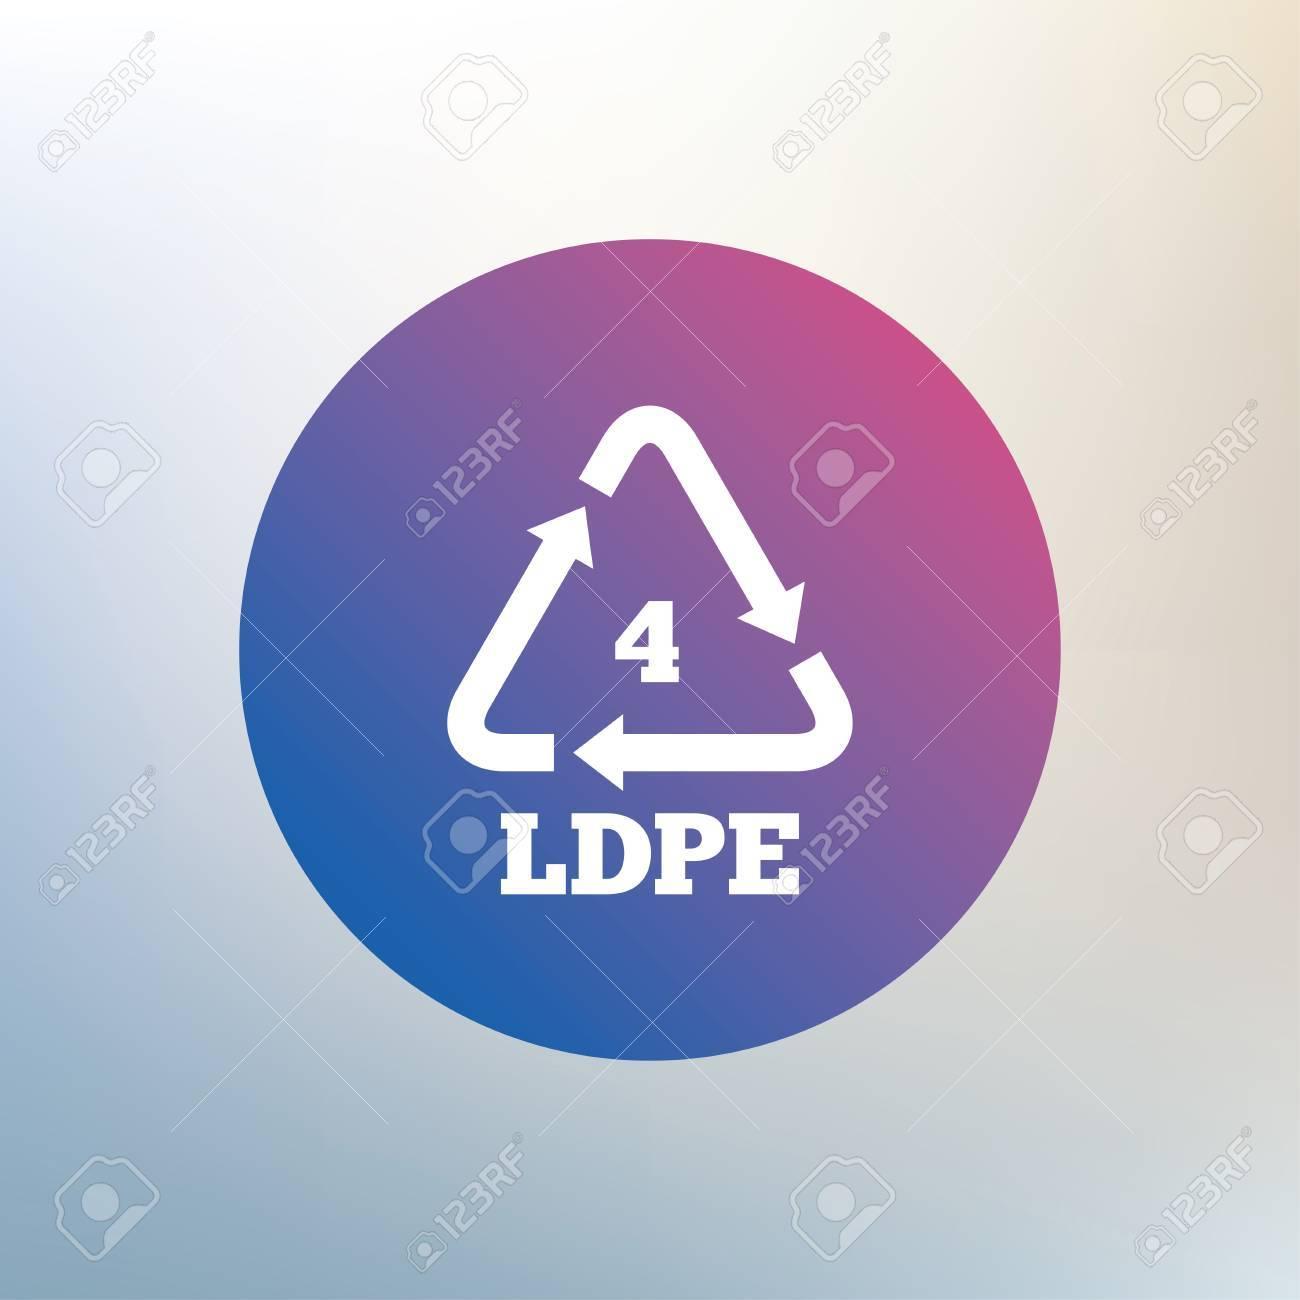 Ld pe 4 icon low density polyethylene sign recycling symbol ld pe 4 icon low density polyethylene sign recycling symbol icon biocorpaavc Choice Image